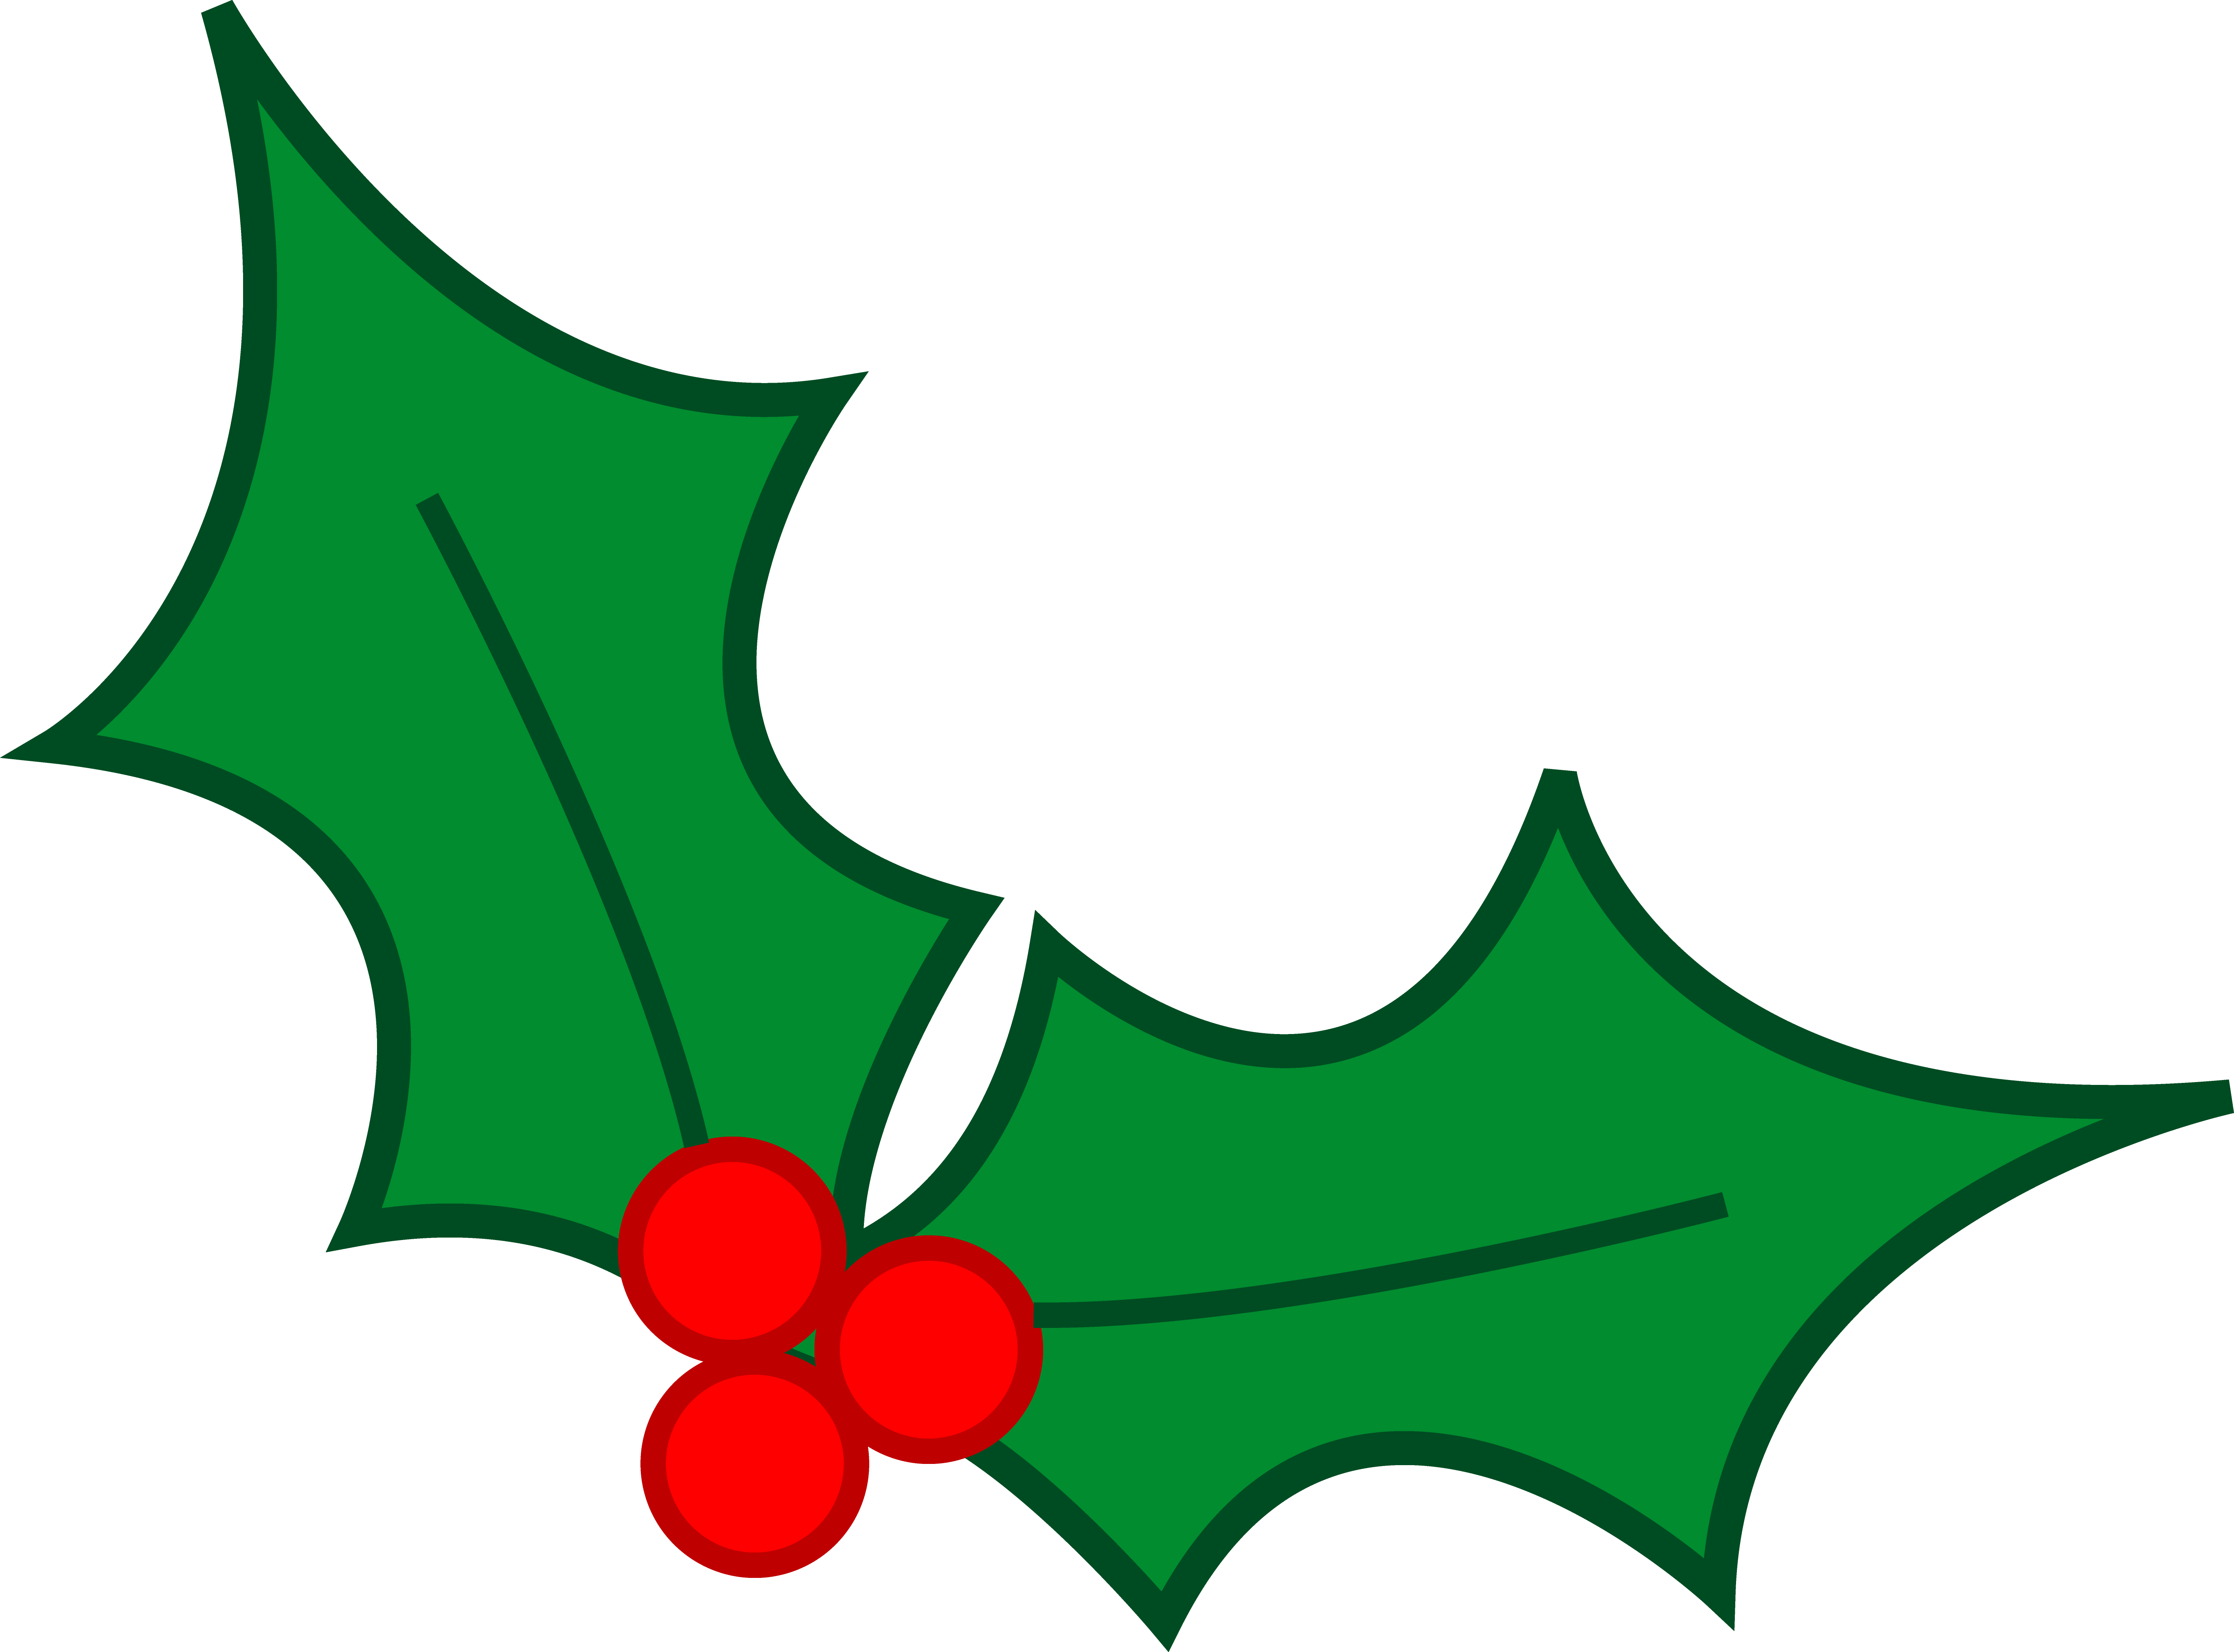 Christmas tree clipart .-Christmas tree clipart .-17